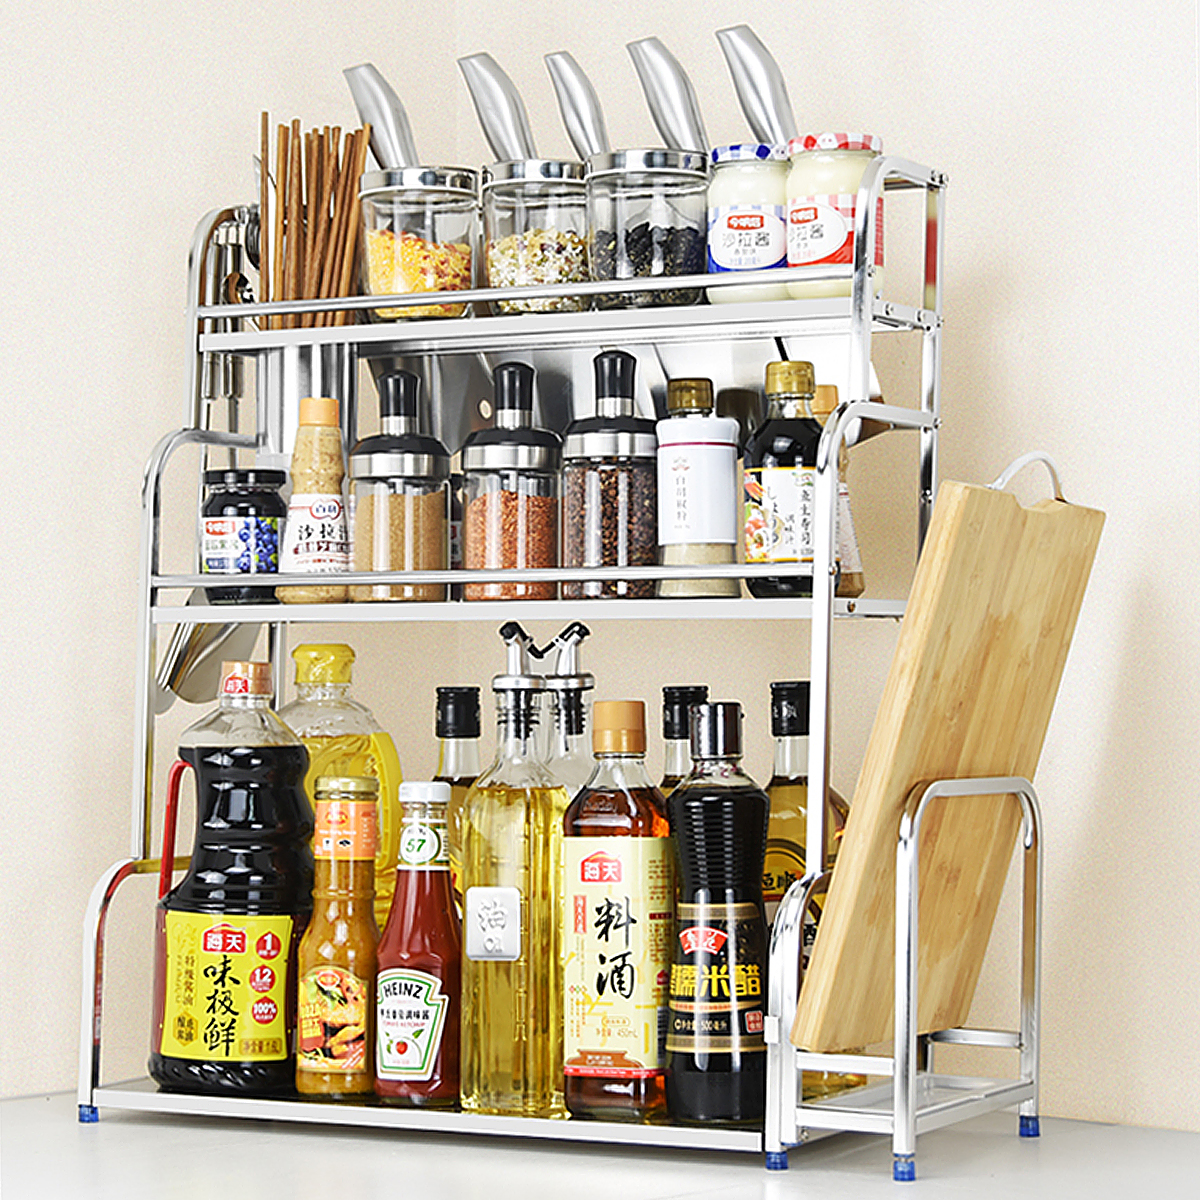 kitchen spice rack stainless steel spice rack organizer for countertop 2 tier 3 tier metal kitchen organizer standing bottle seasoning hanging shelf